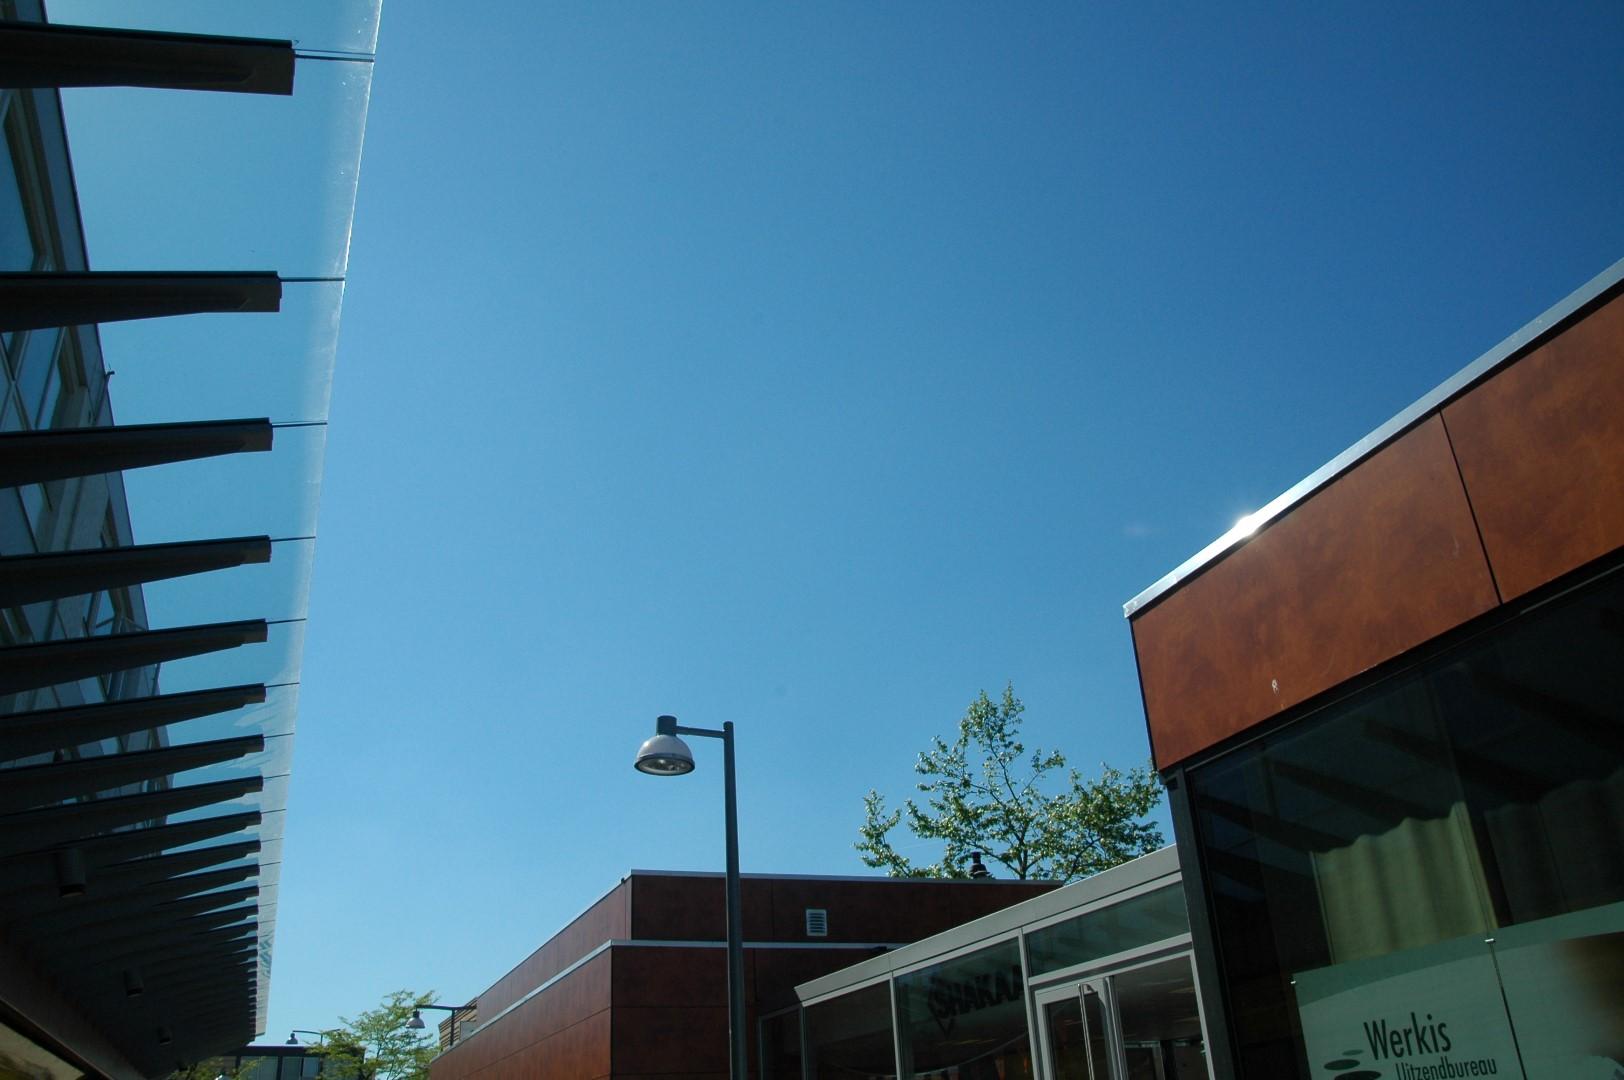 stoel_architect_Kampen_nieuwbouw_winkelcentrum Emmeloord (4) (Large)